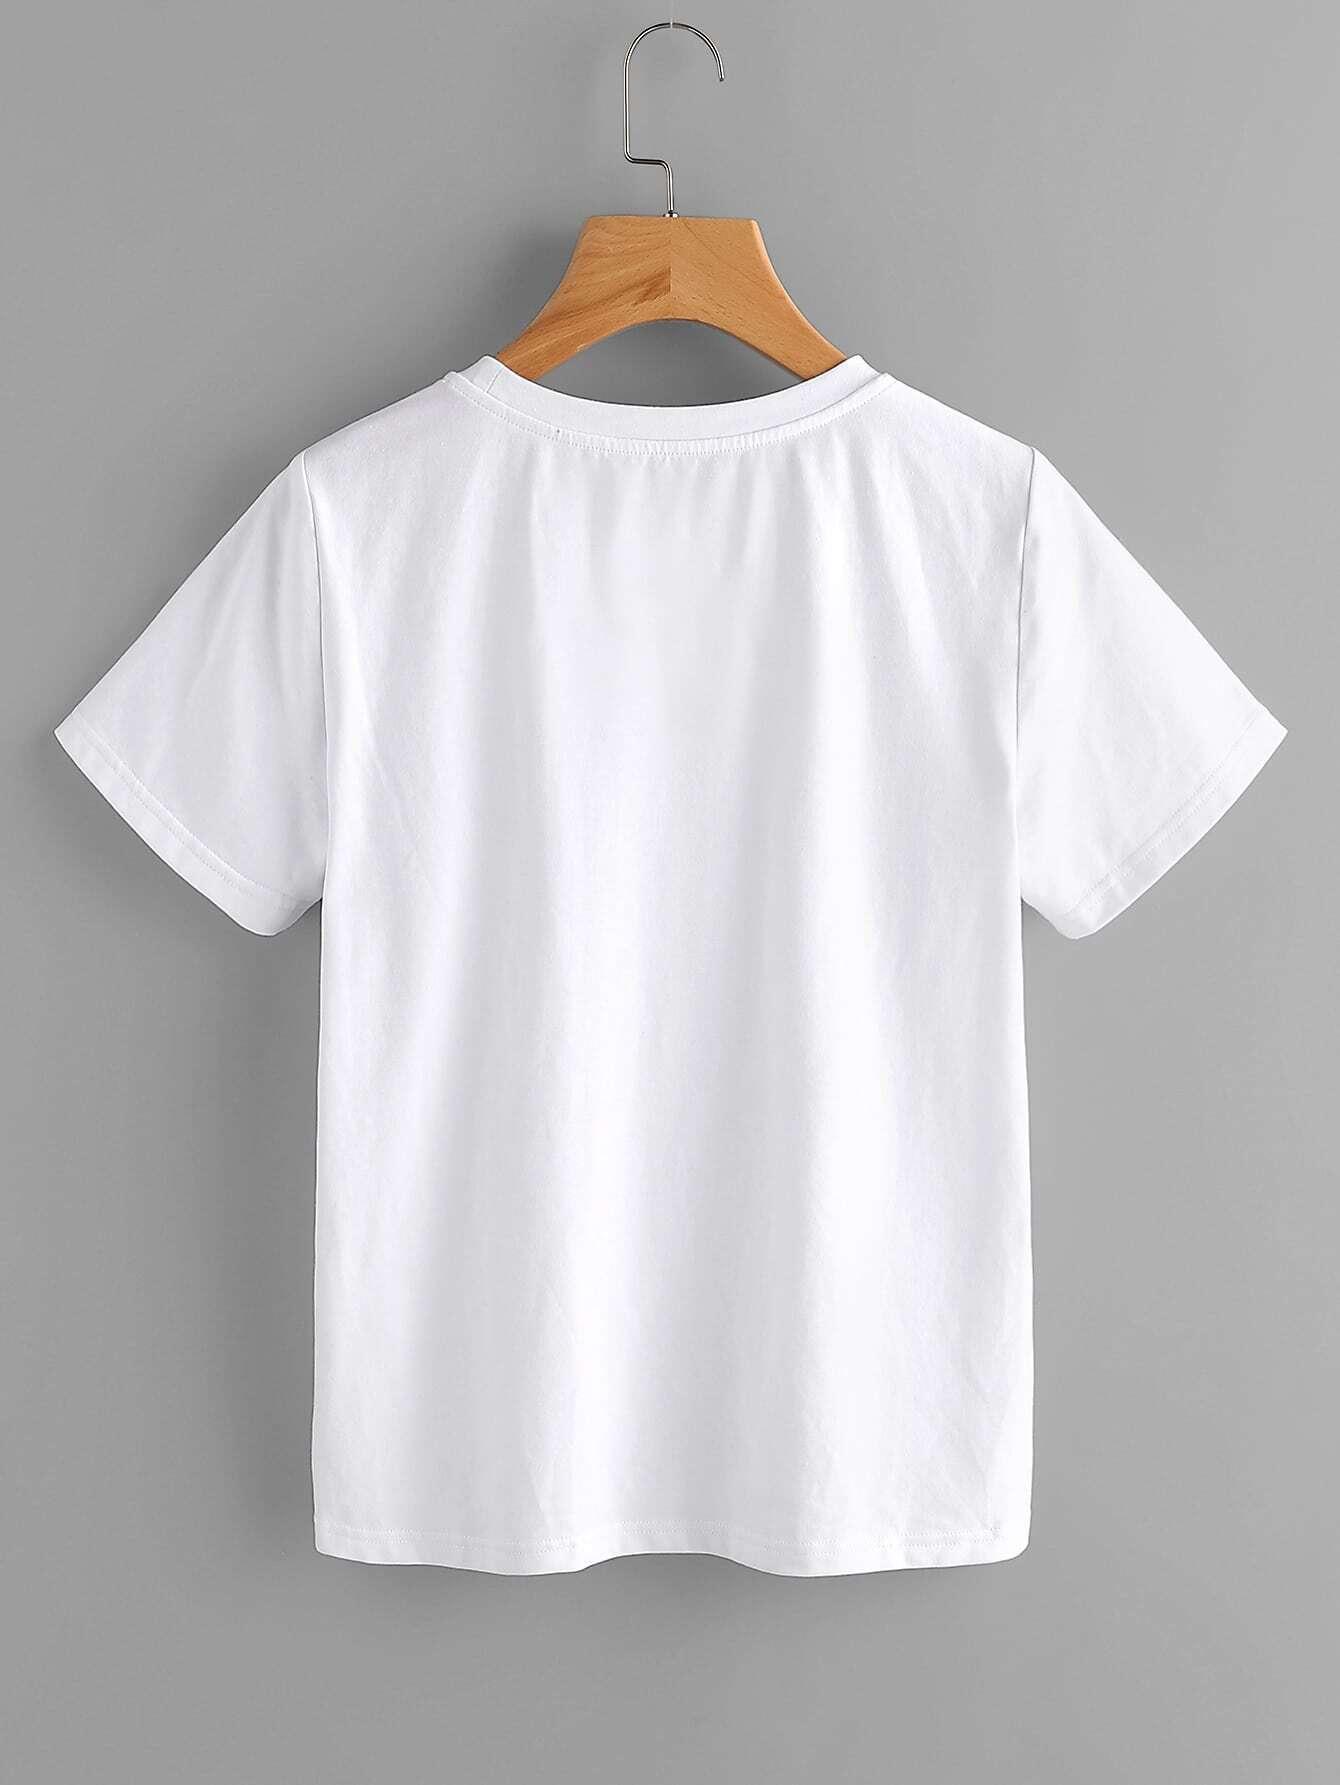 Closed Eyes Print T-shirt